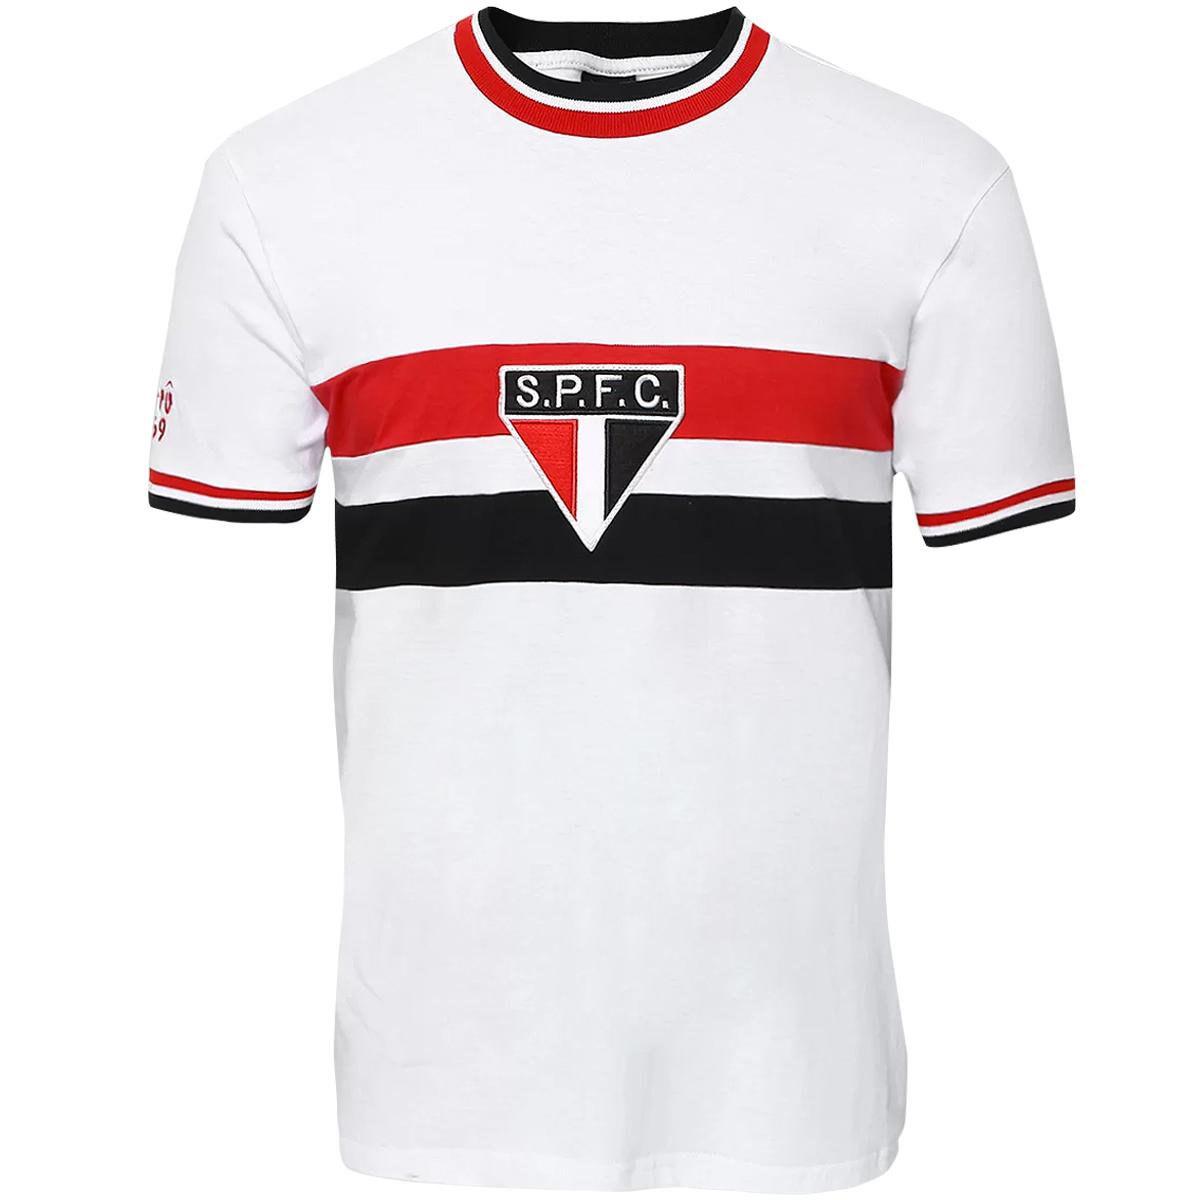 Camisa São Paulo Retrô 1969 Masculina